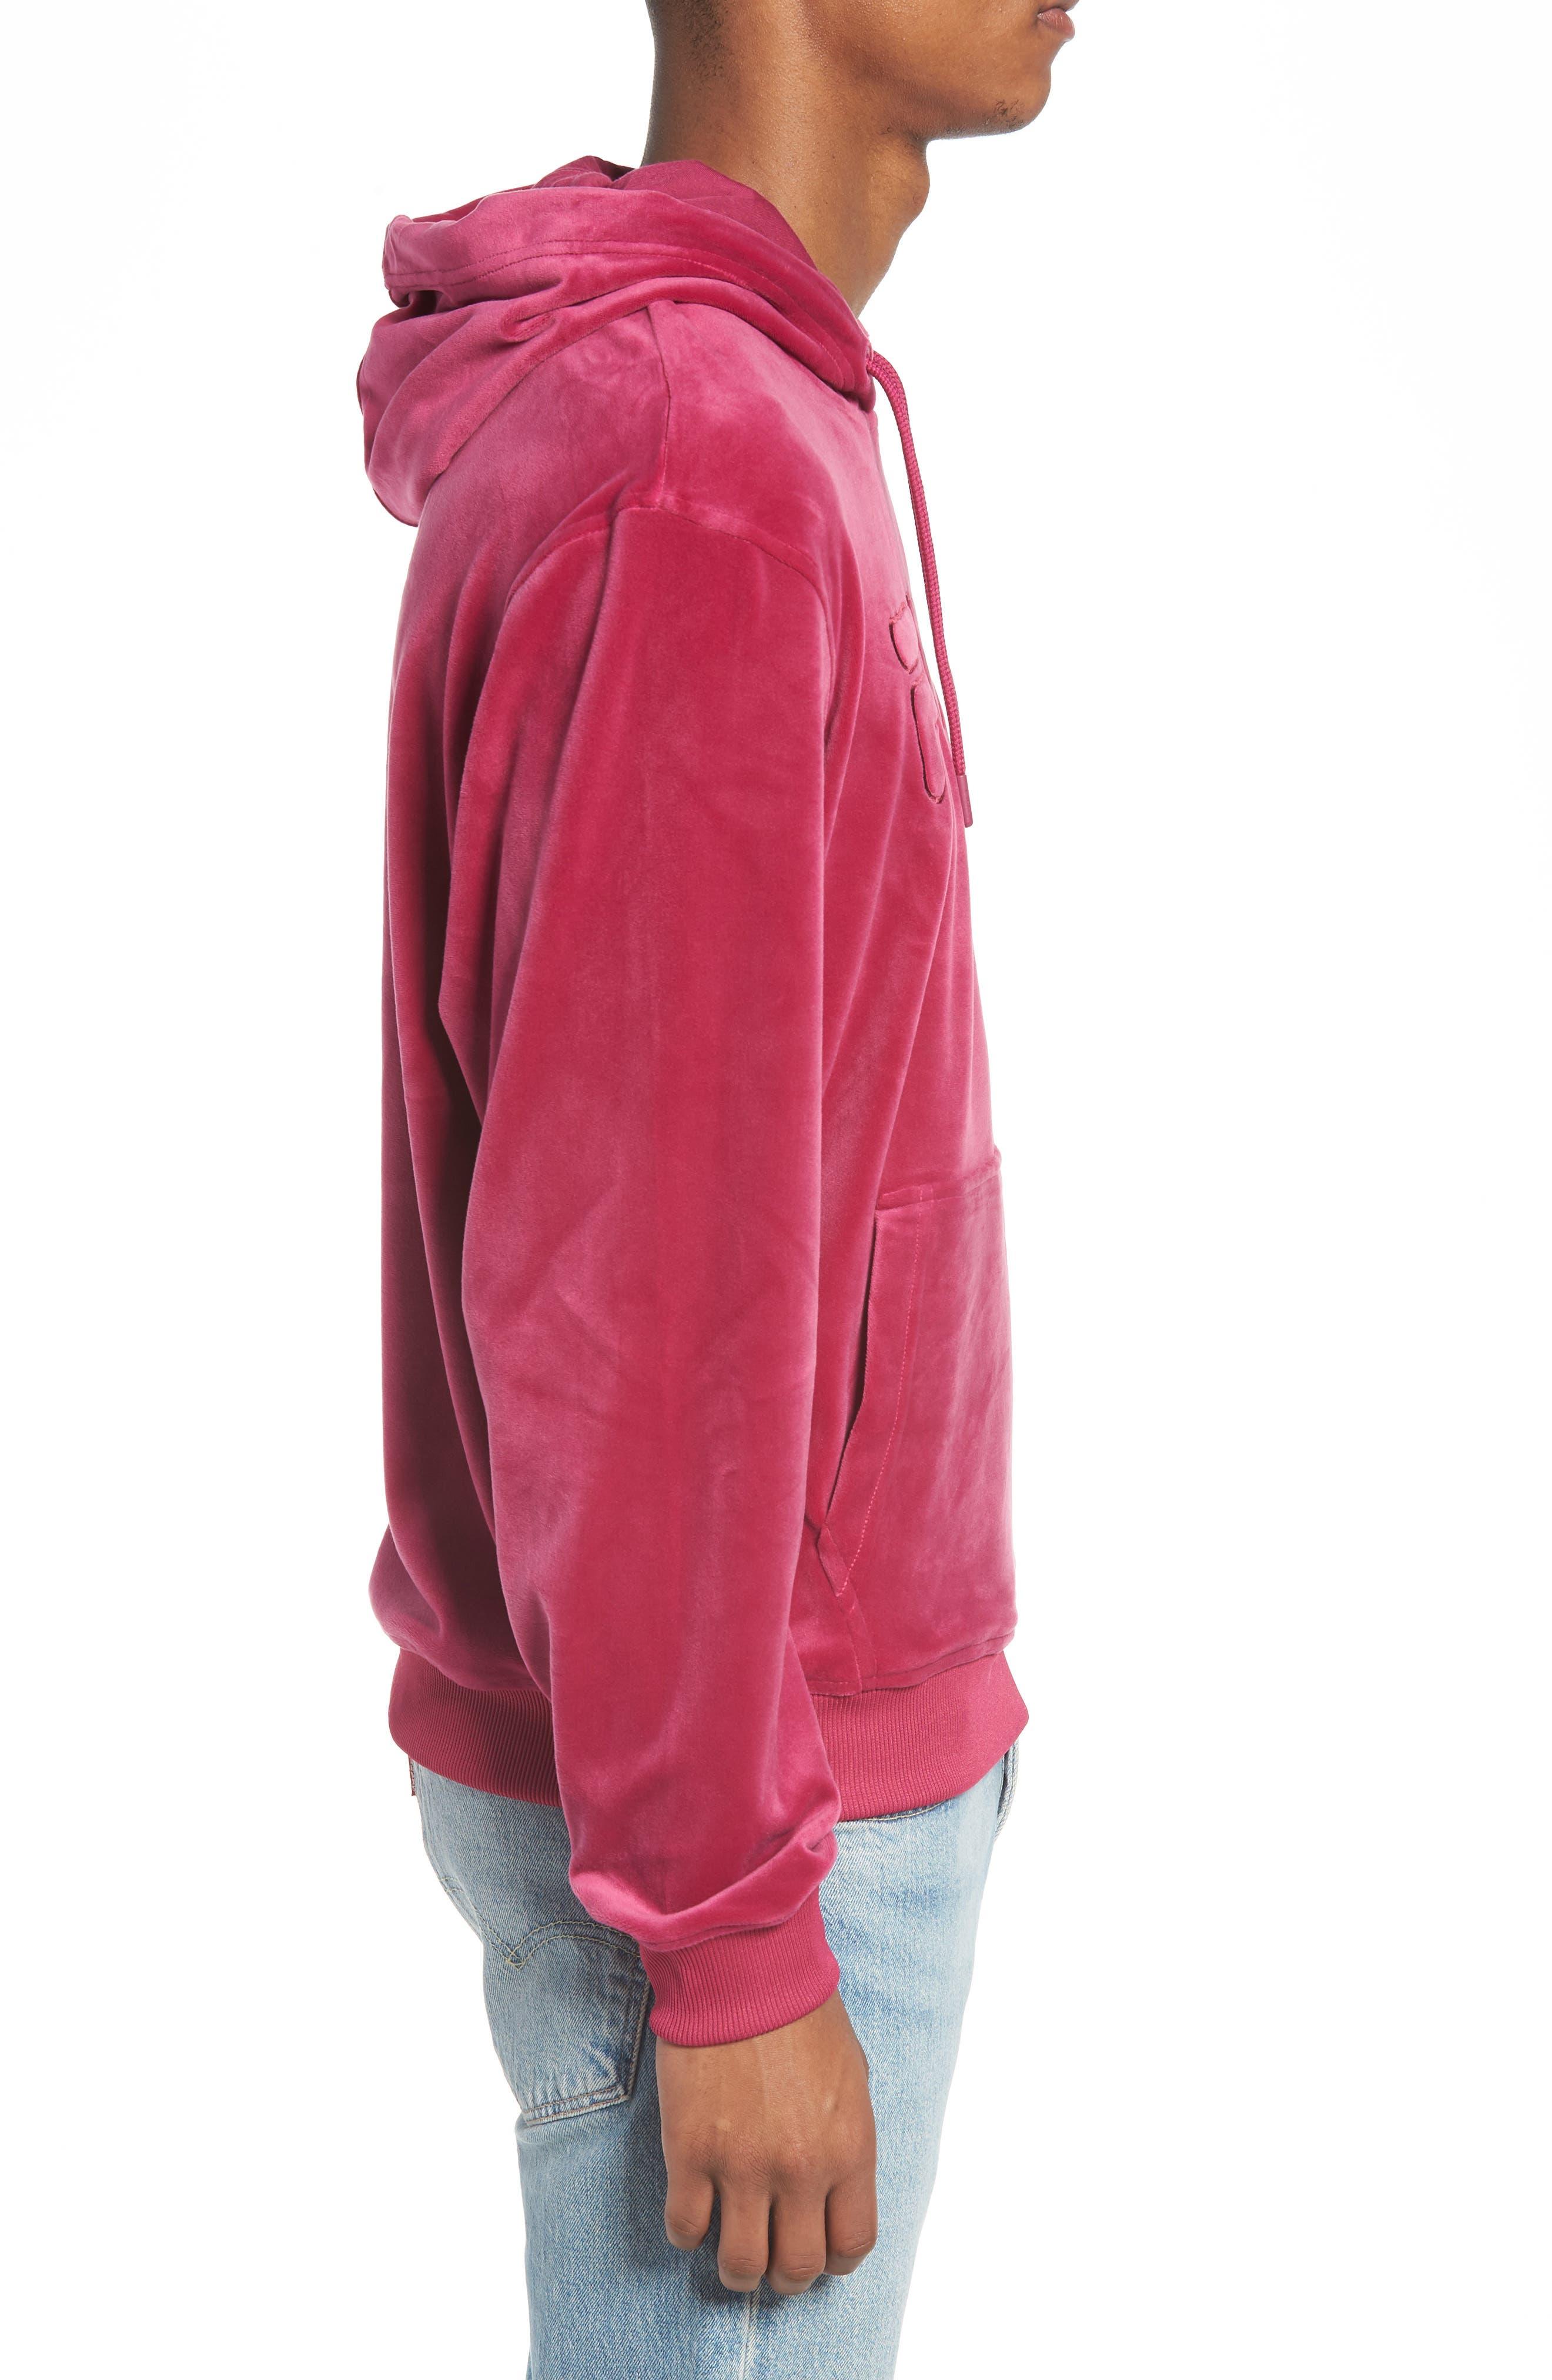 Asher Velour Hoodie Sweatshirt,                             Alternate thumbnail 3, color,                             Rasberry Radiance